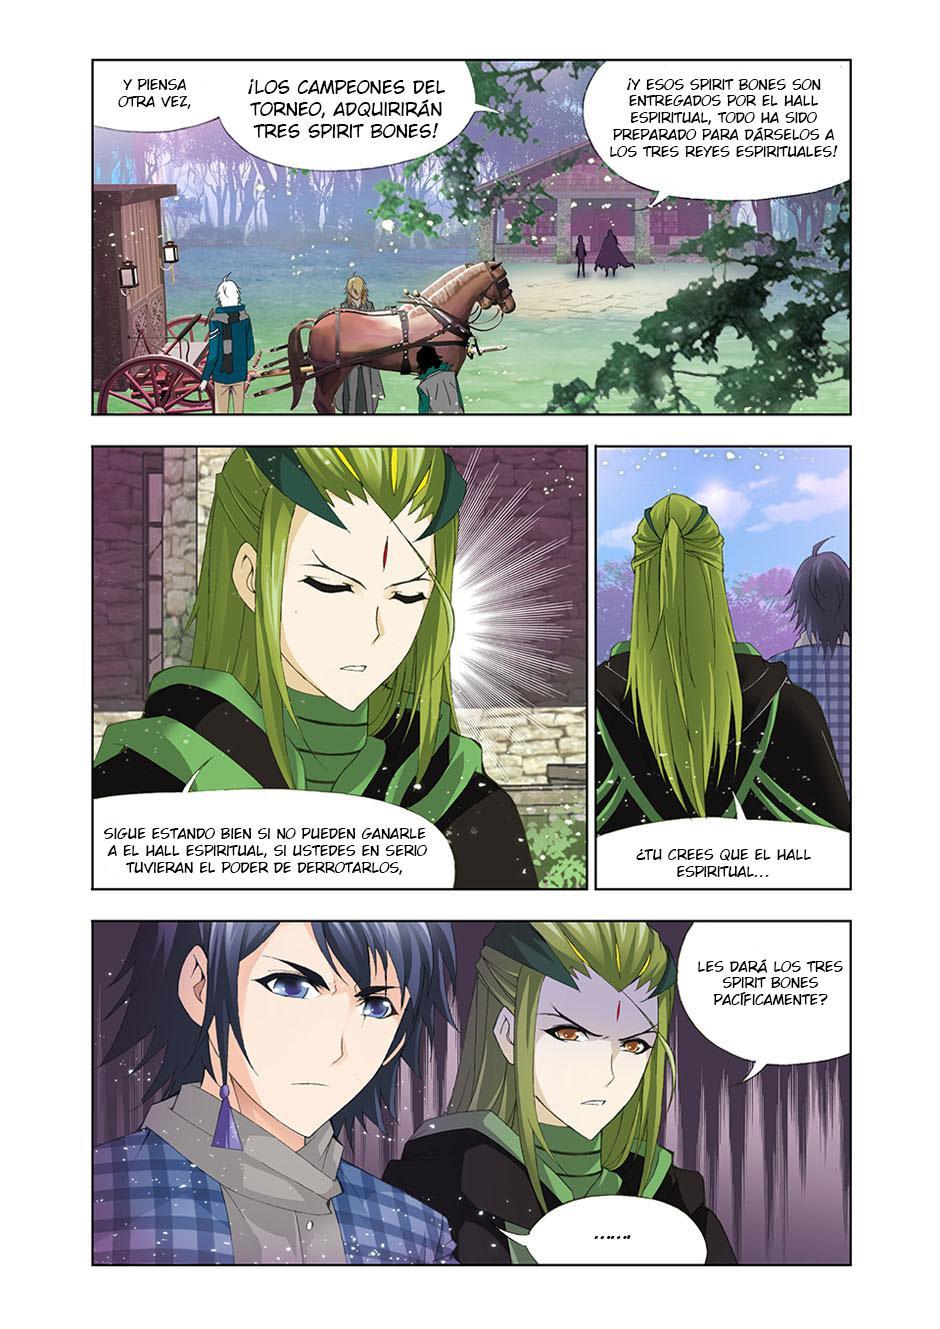 https://c5.ninemanga.com/es_manga/18/16210/417006/2c6037040bf5058a44be4c0397611909.jpg Page 7